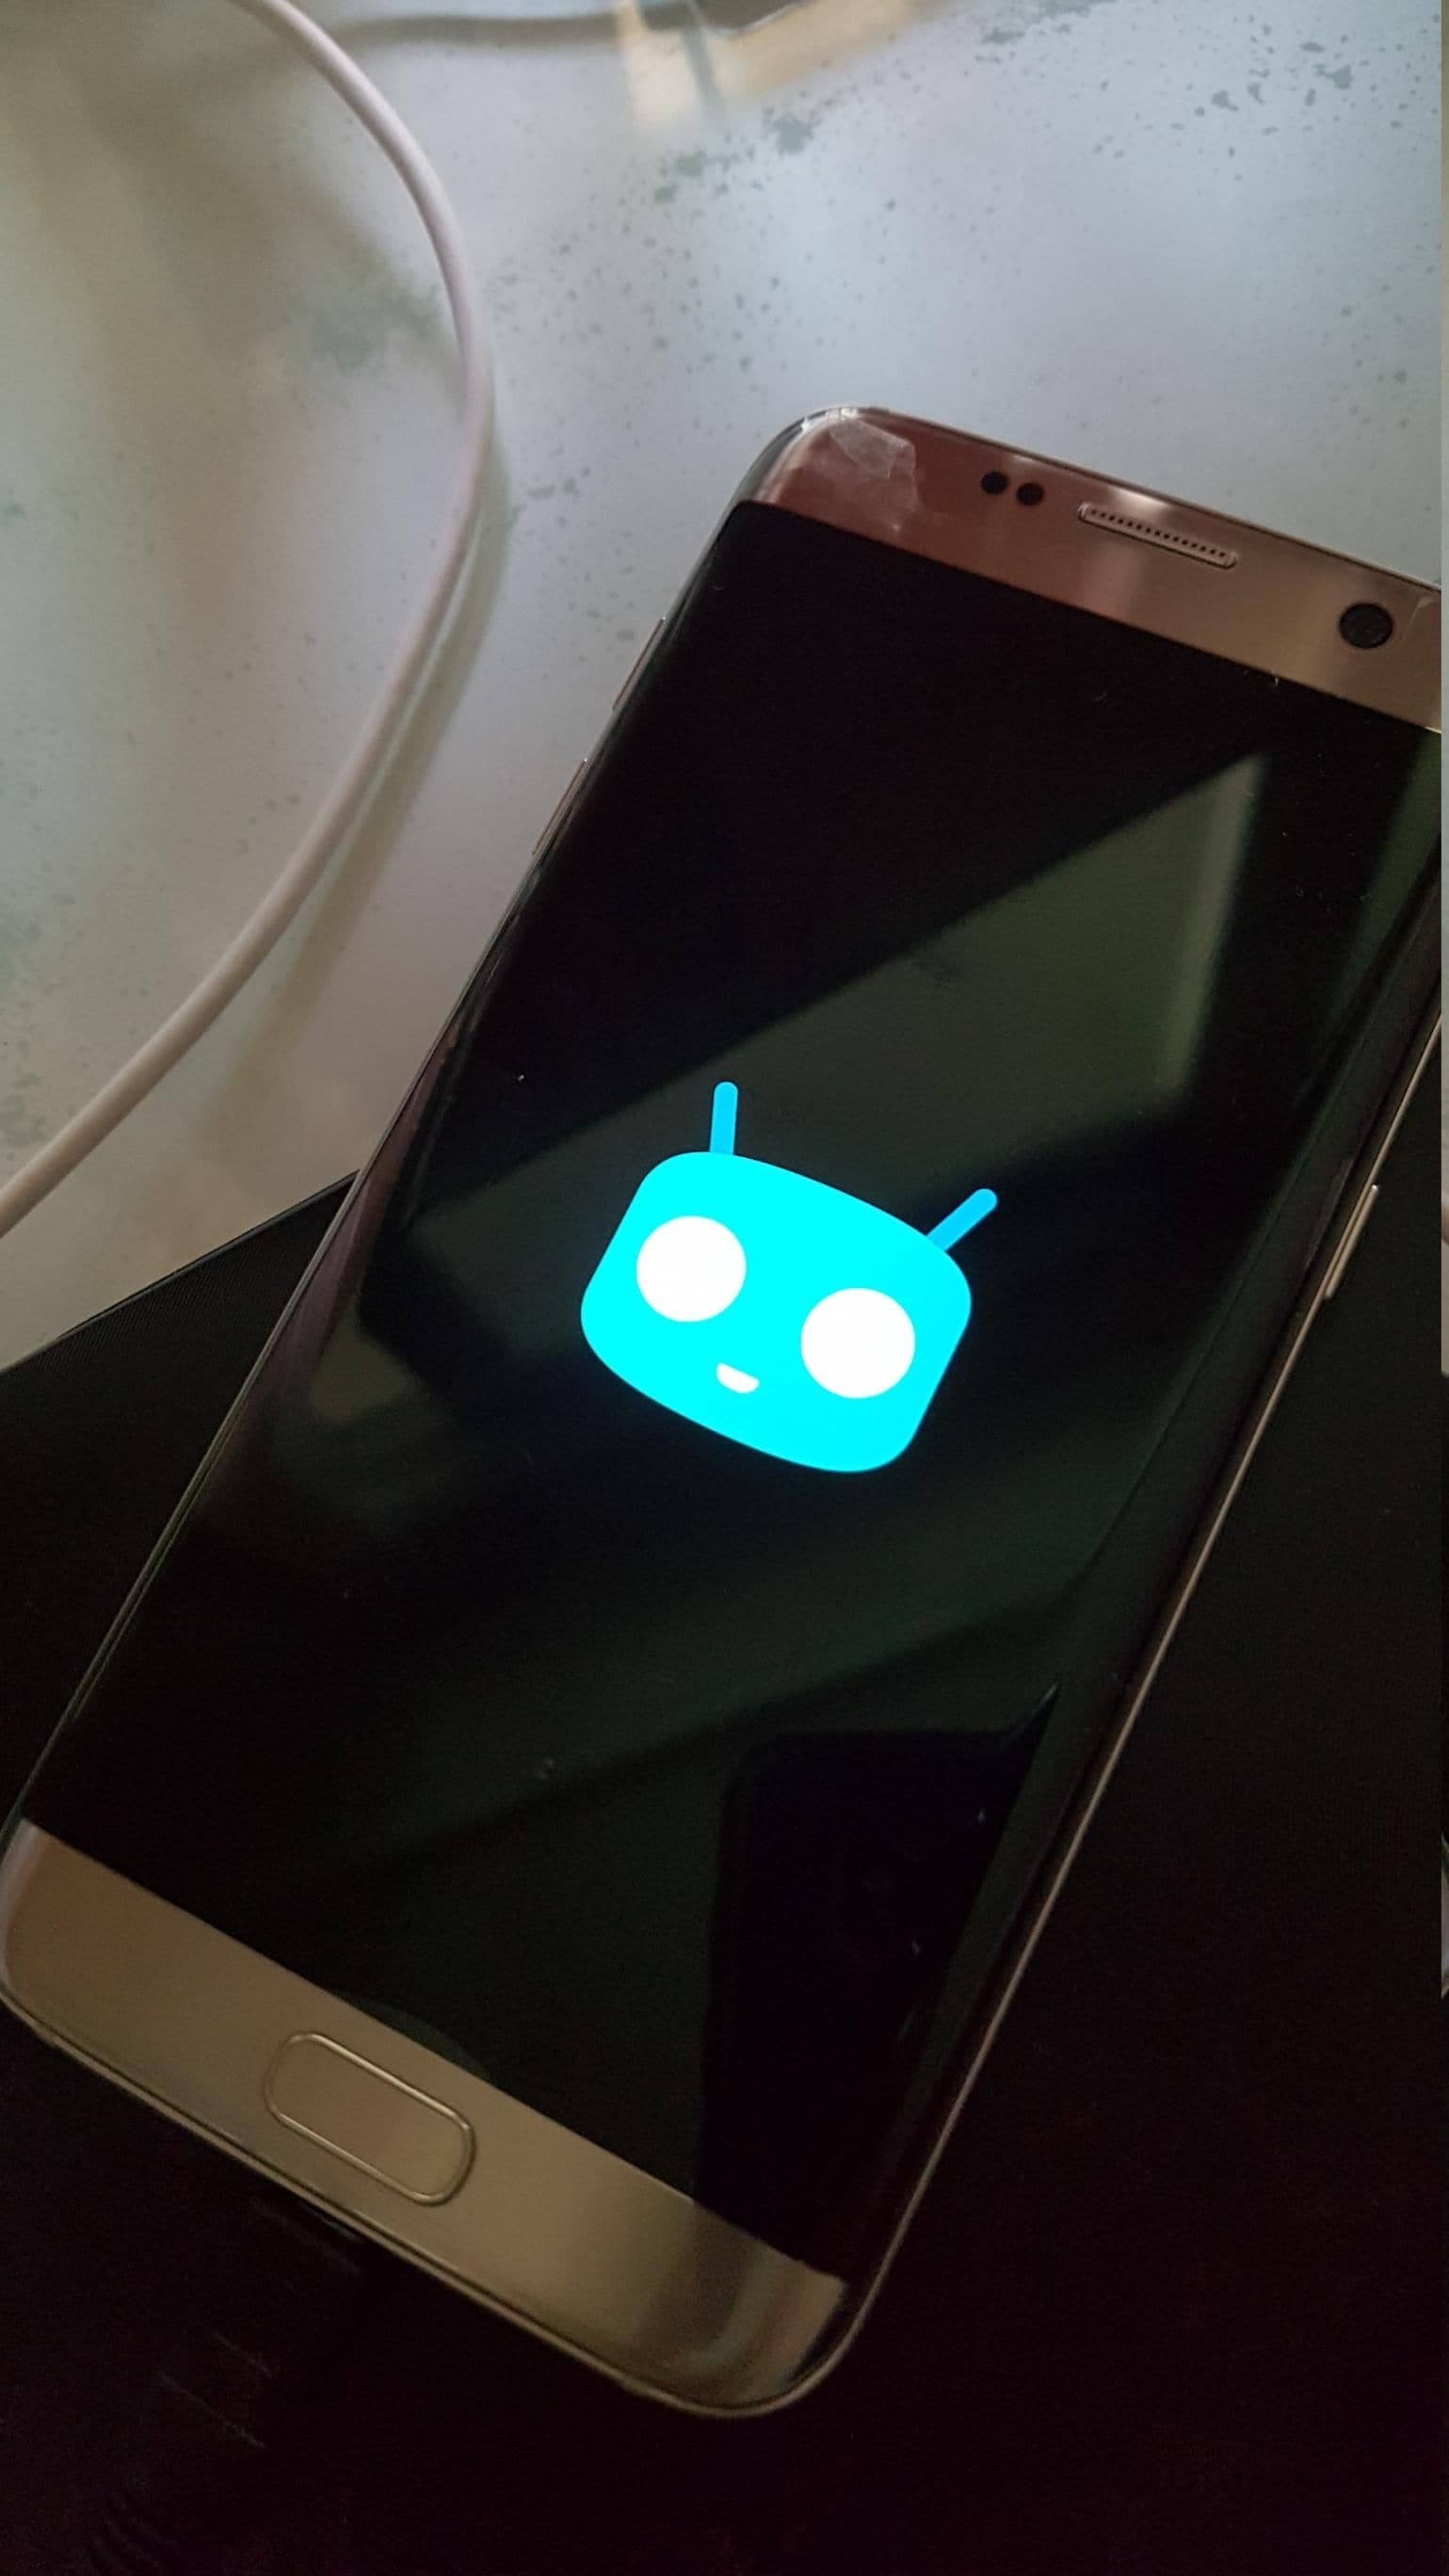 Galaxy S7 edge CyanogenMod 13 – 1